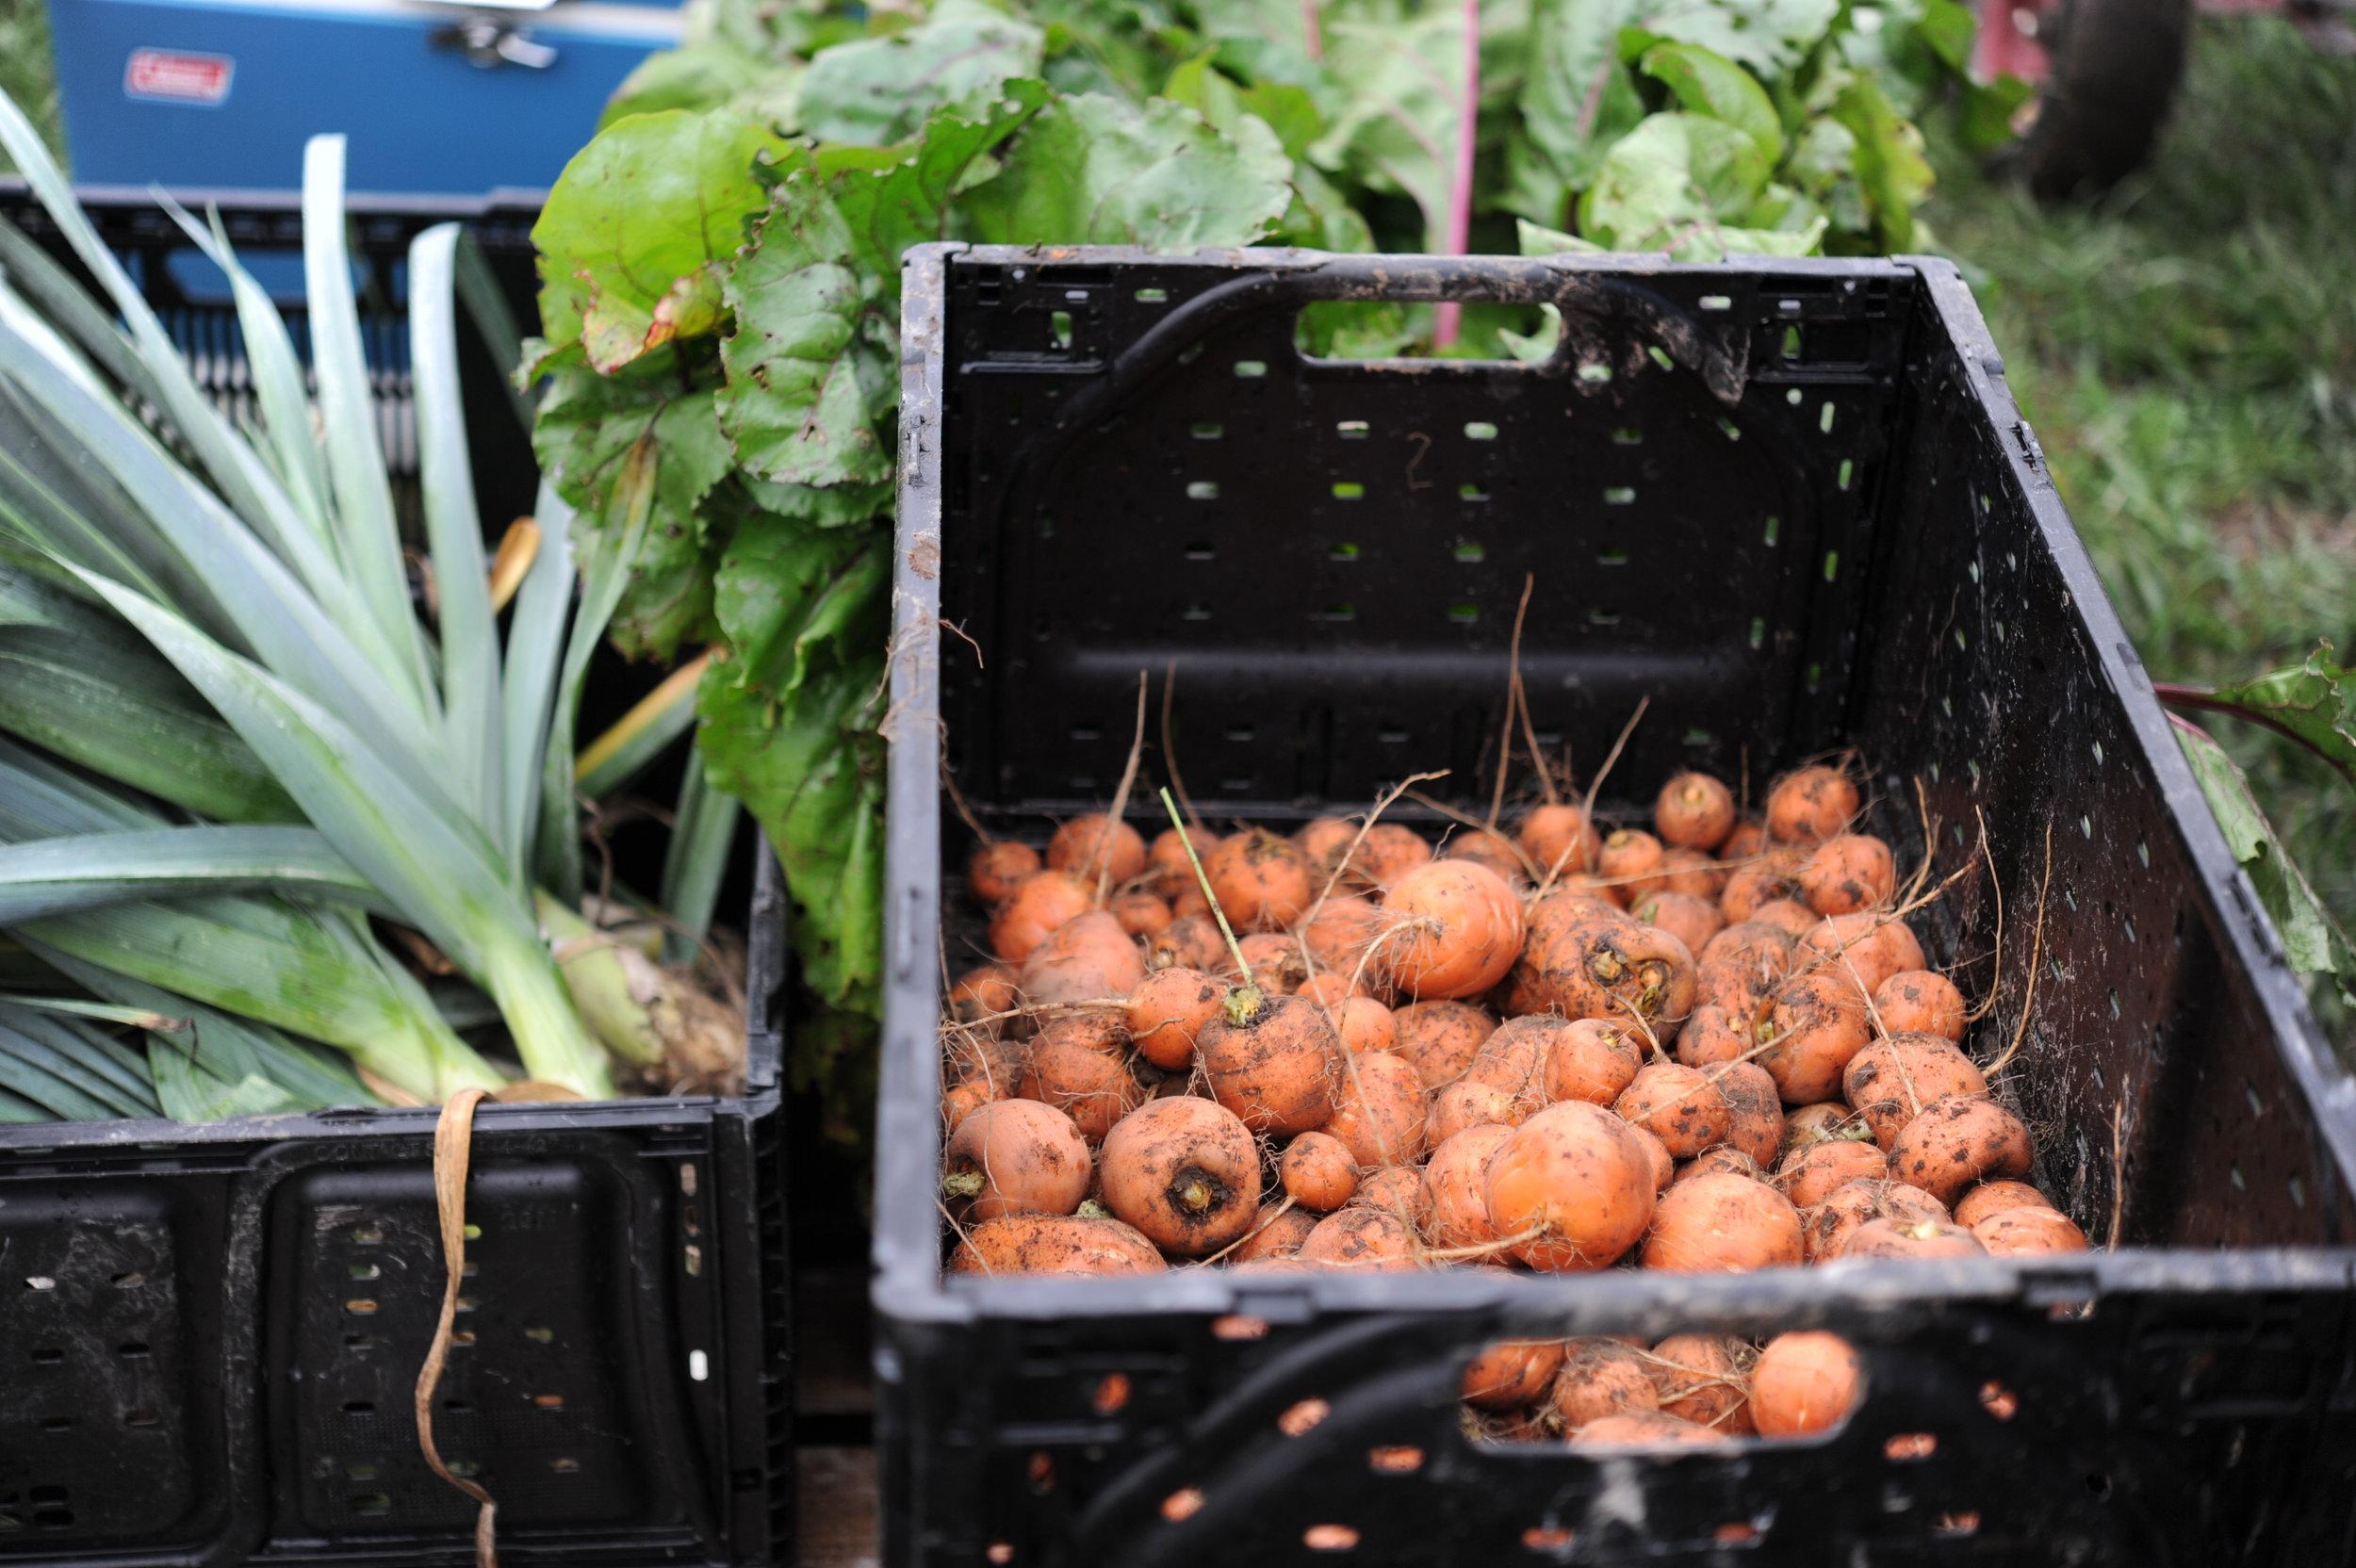 Parisian Market carrots